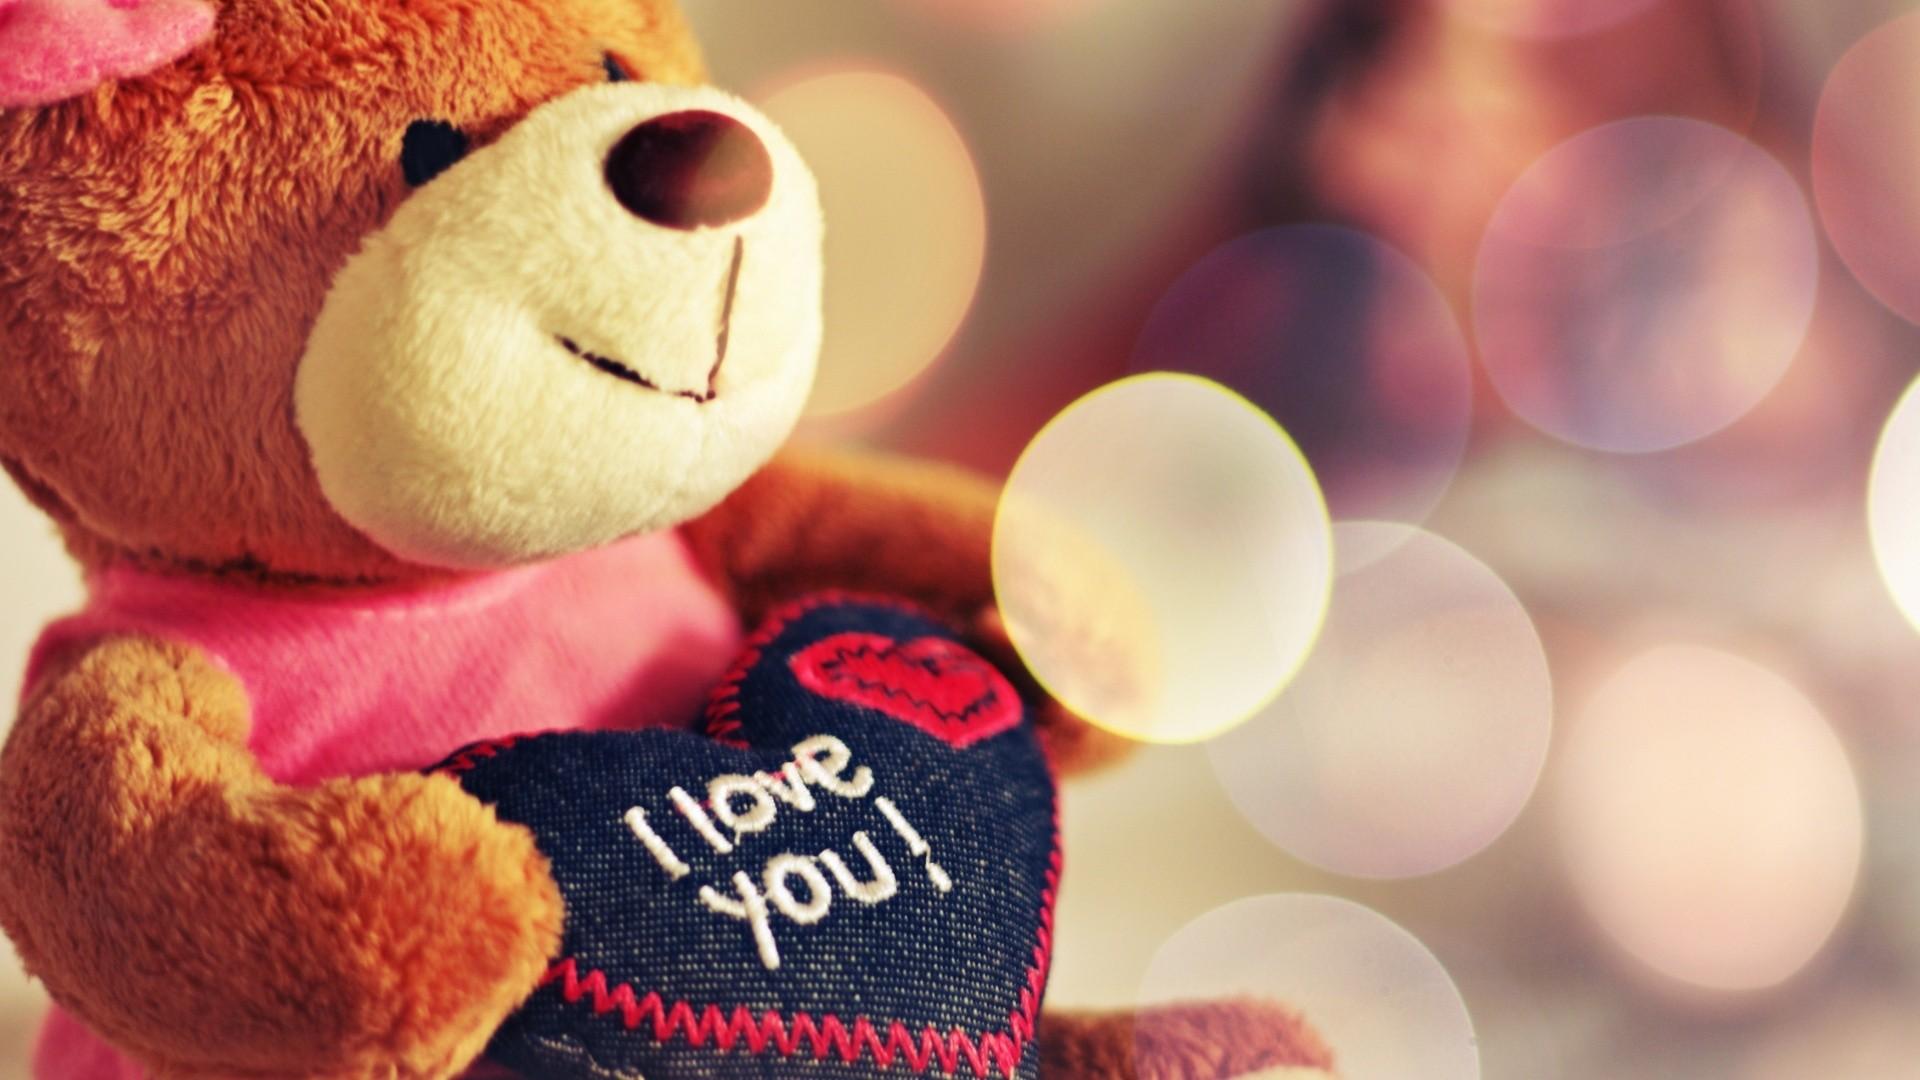 Cute Love Images For Desktop 5 HD Wallpapers